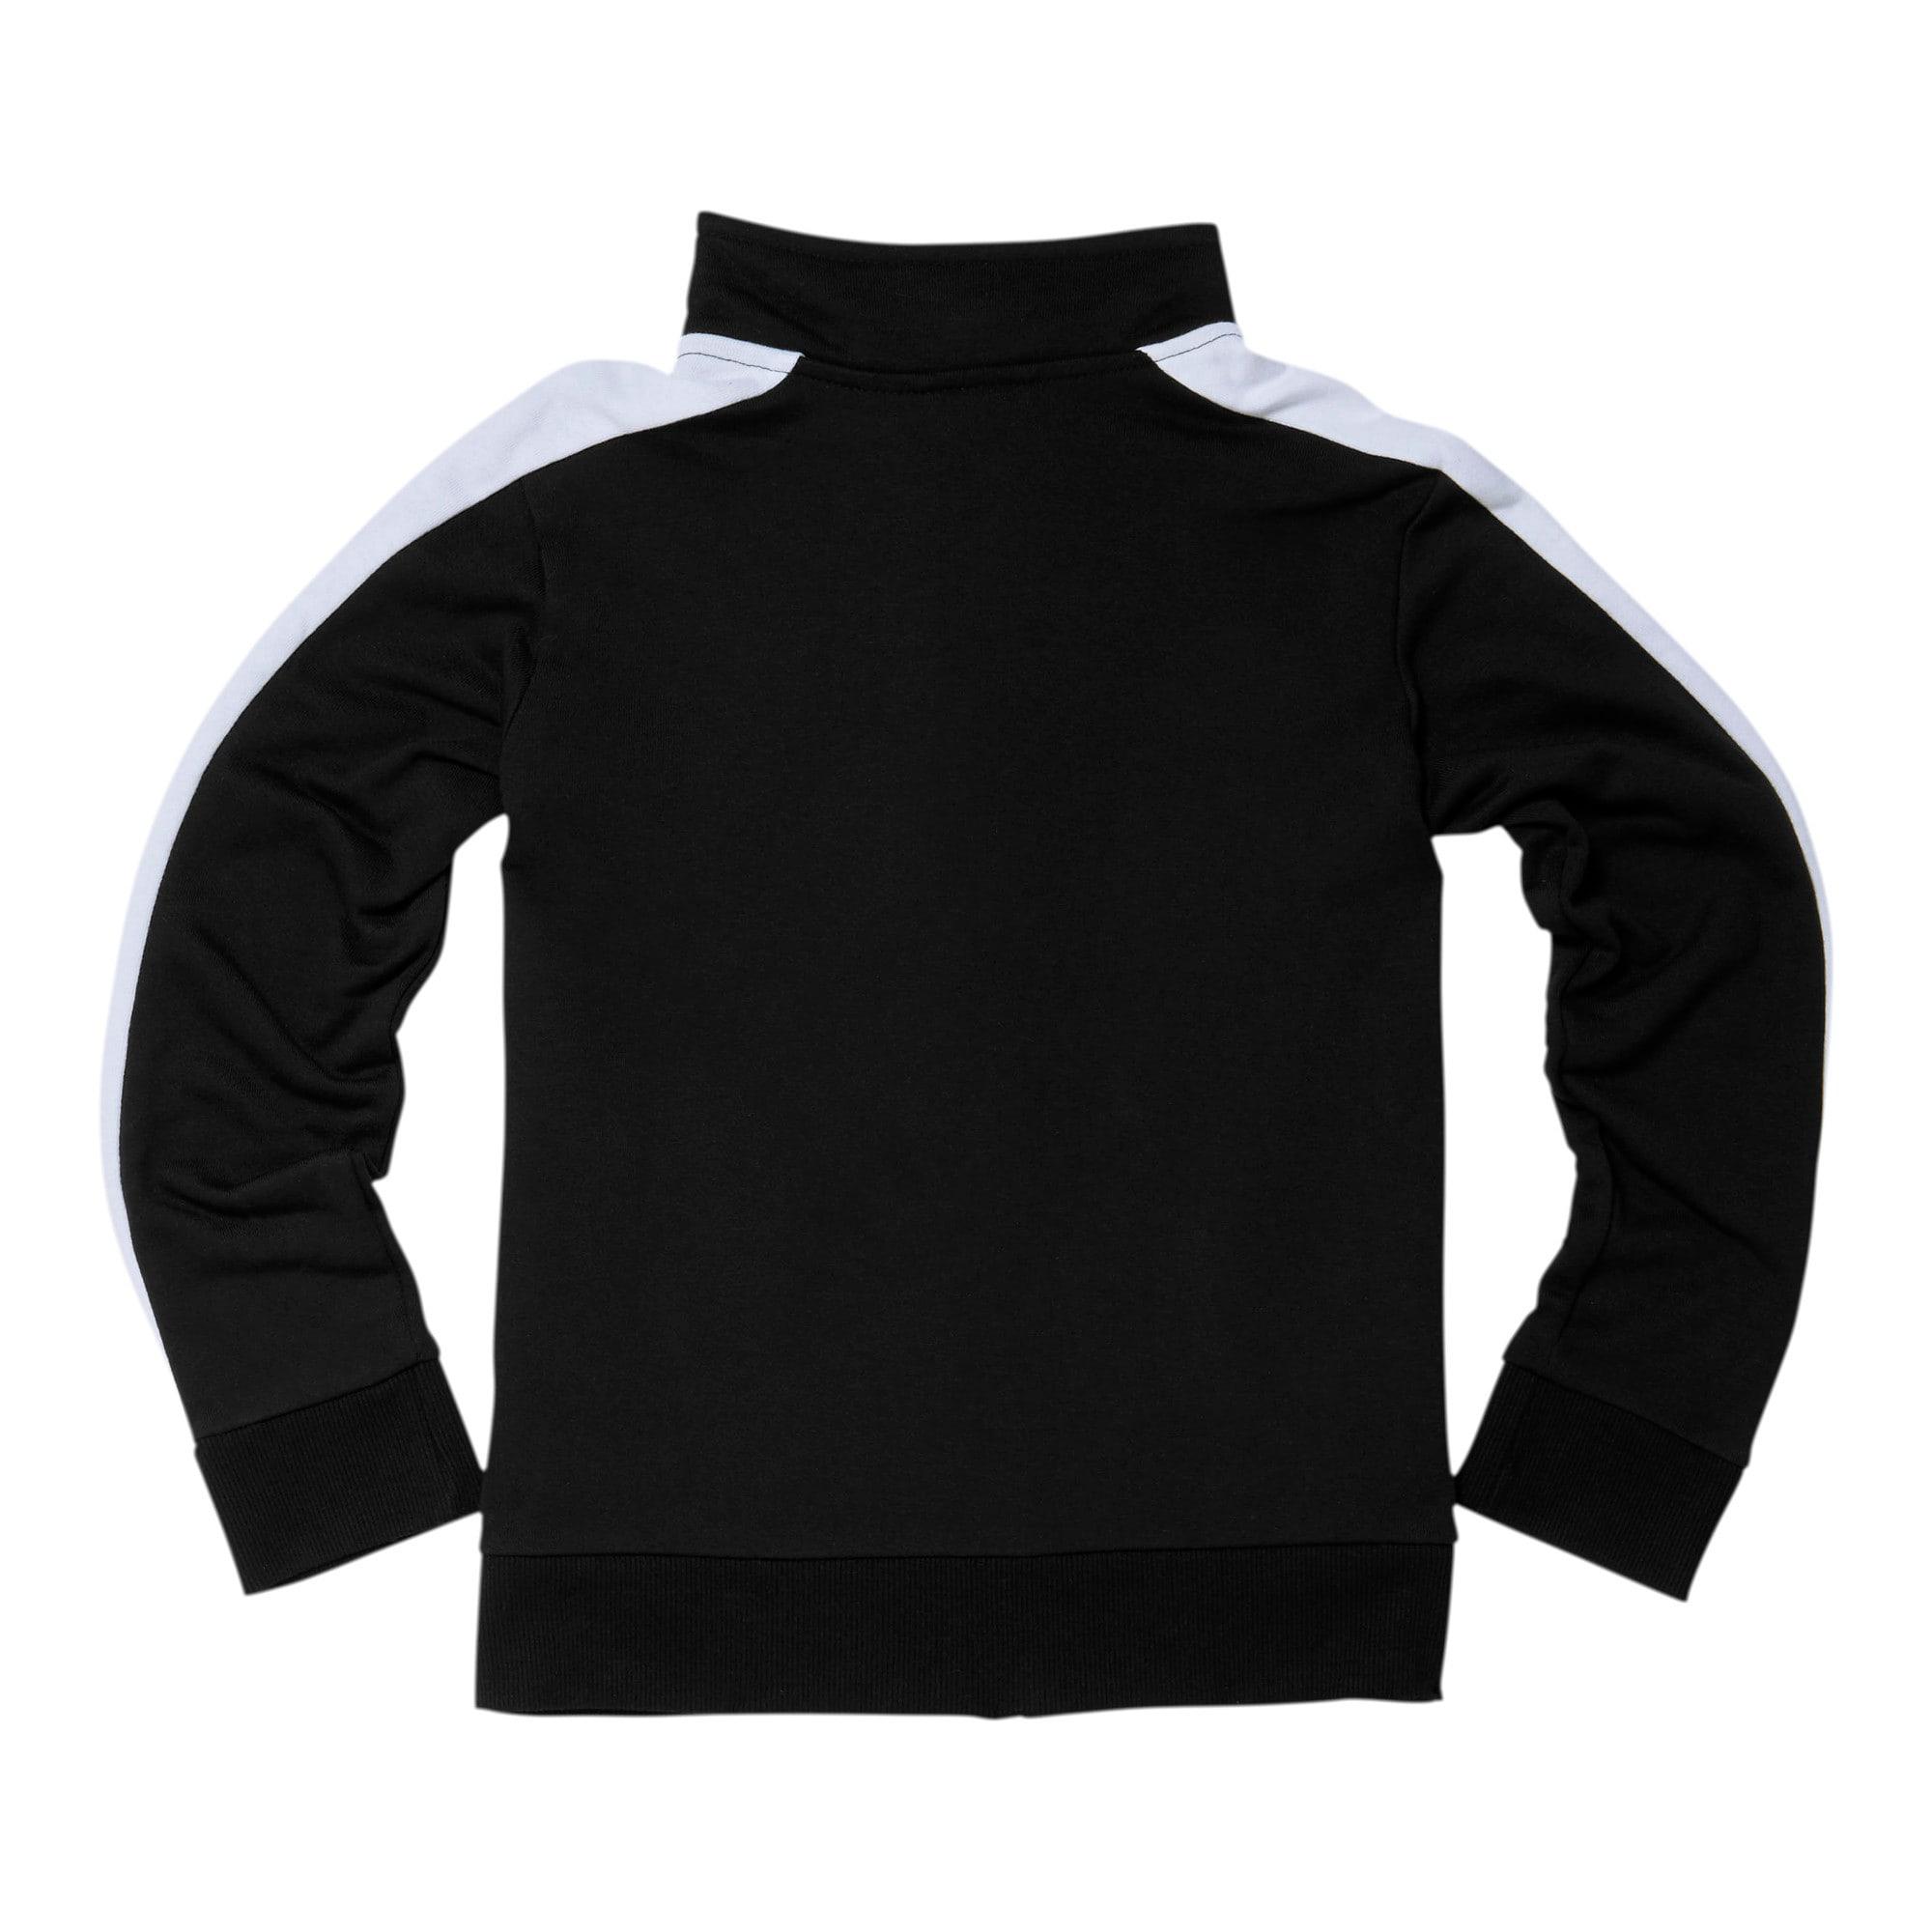 Thumbnail 2 of Boys' T7 Track Jacket JR, PUMA BLACK/WHITE, medium